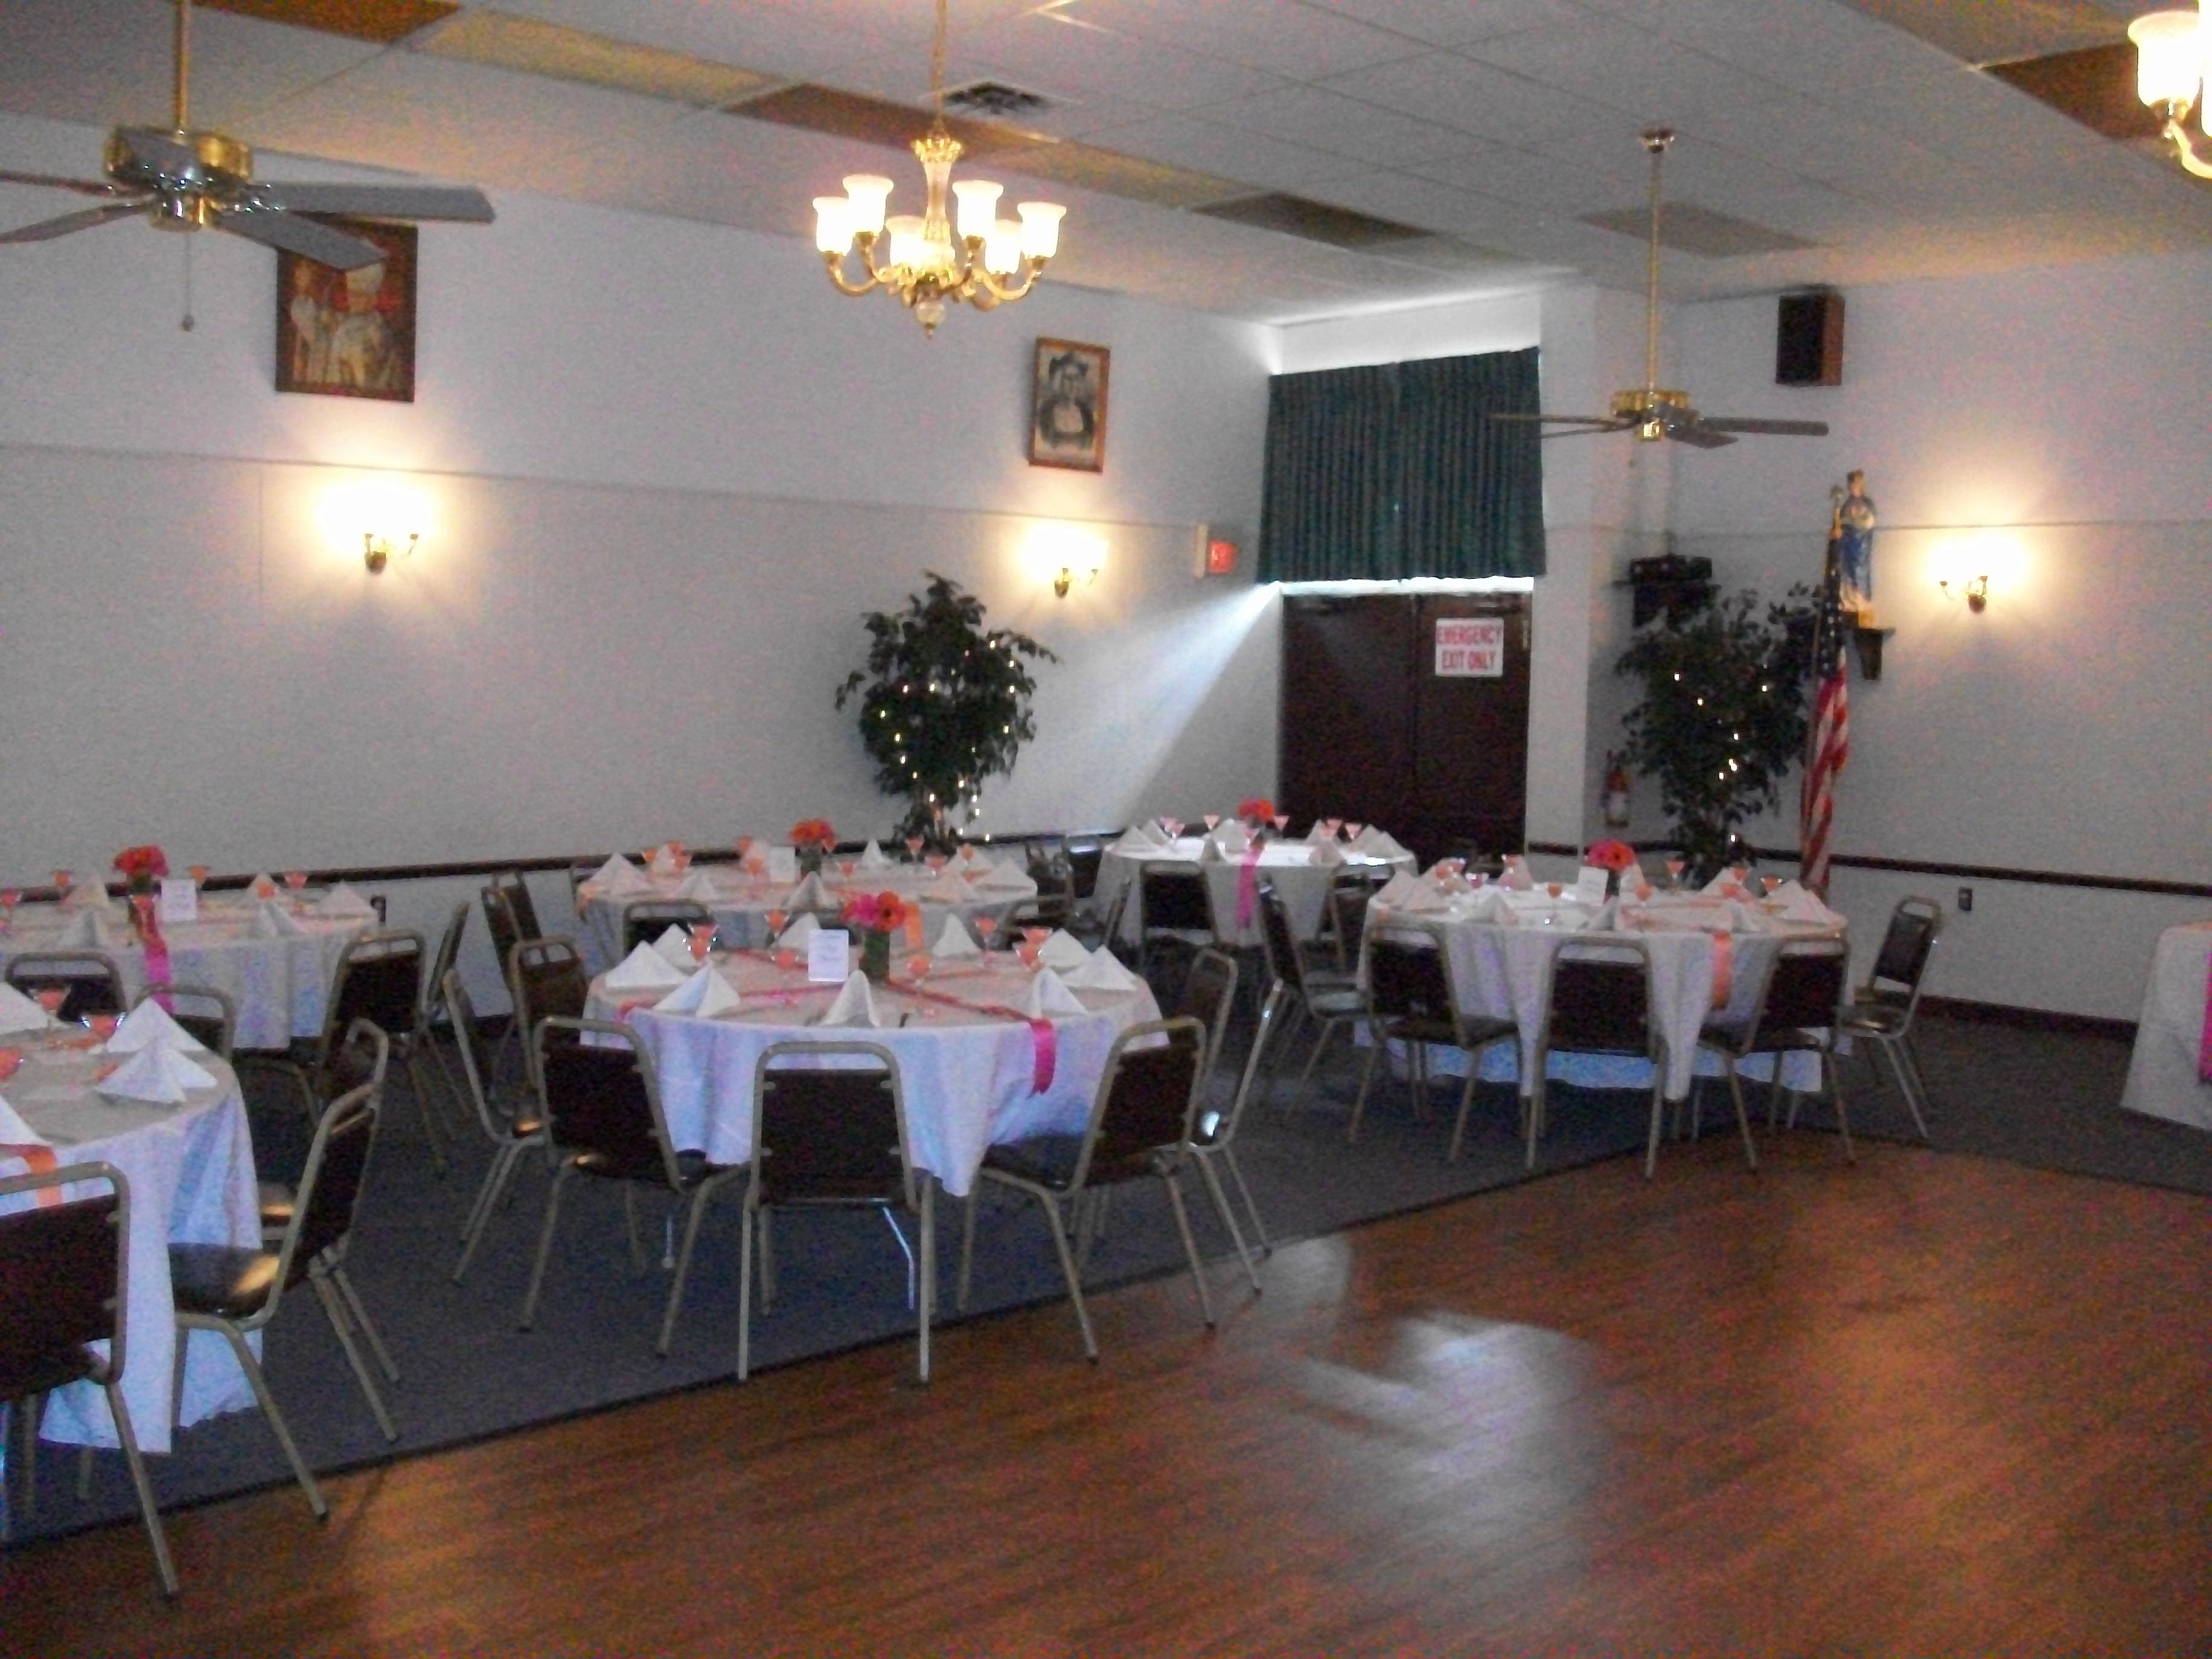 Knights of Columbus Council 1436 Hall Rentals in Delran NJ